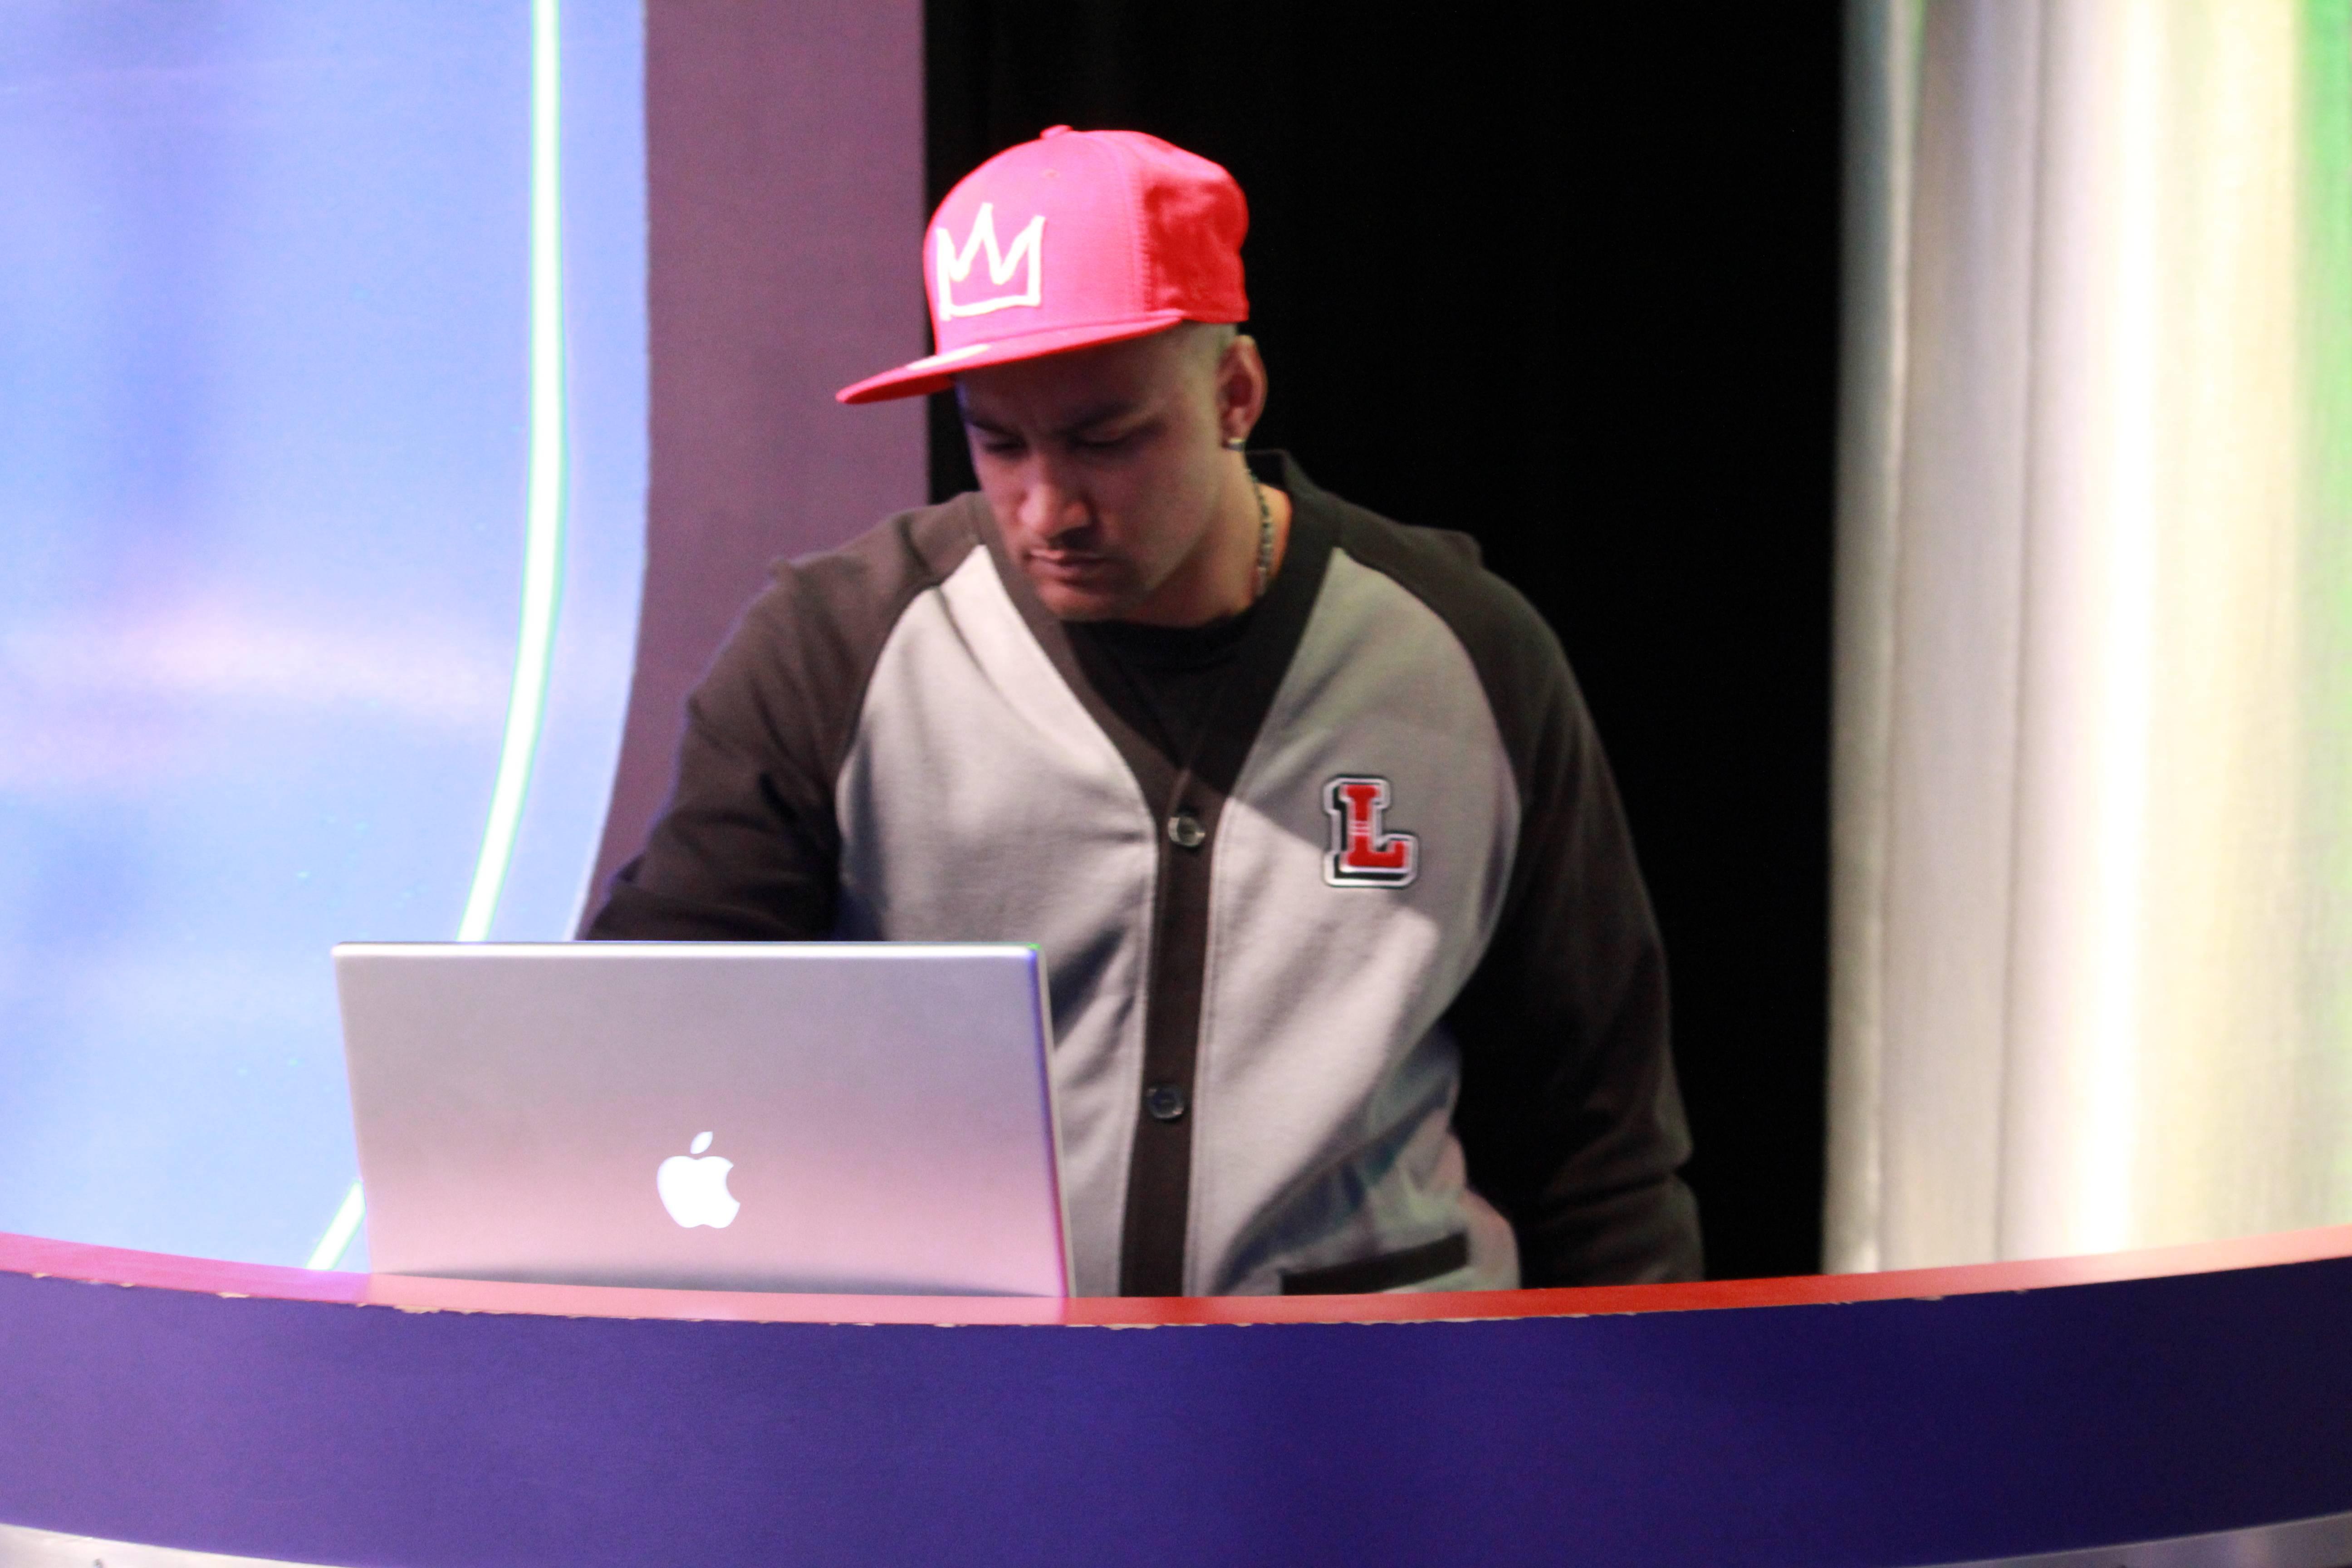 Break It Down - DJ Lyve on set at 106 & Park. (photo by: Slim)